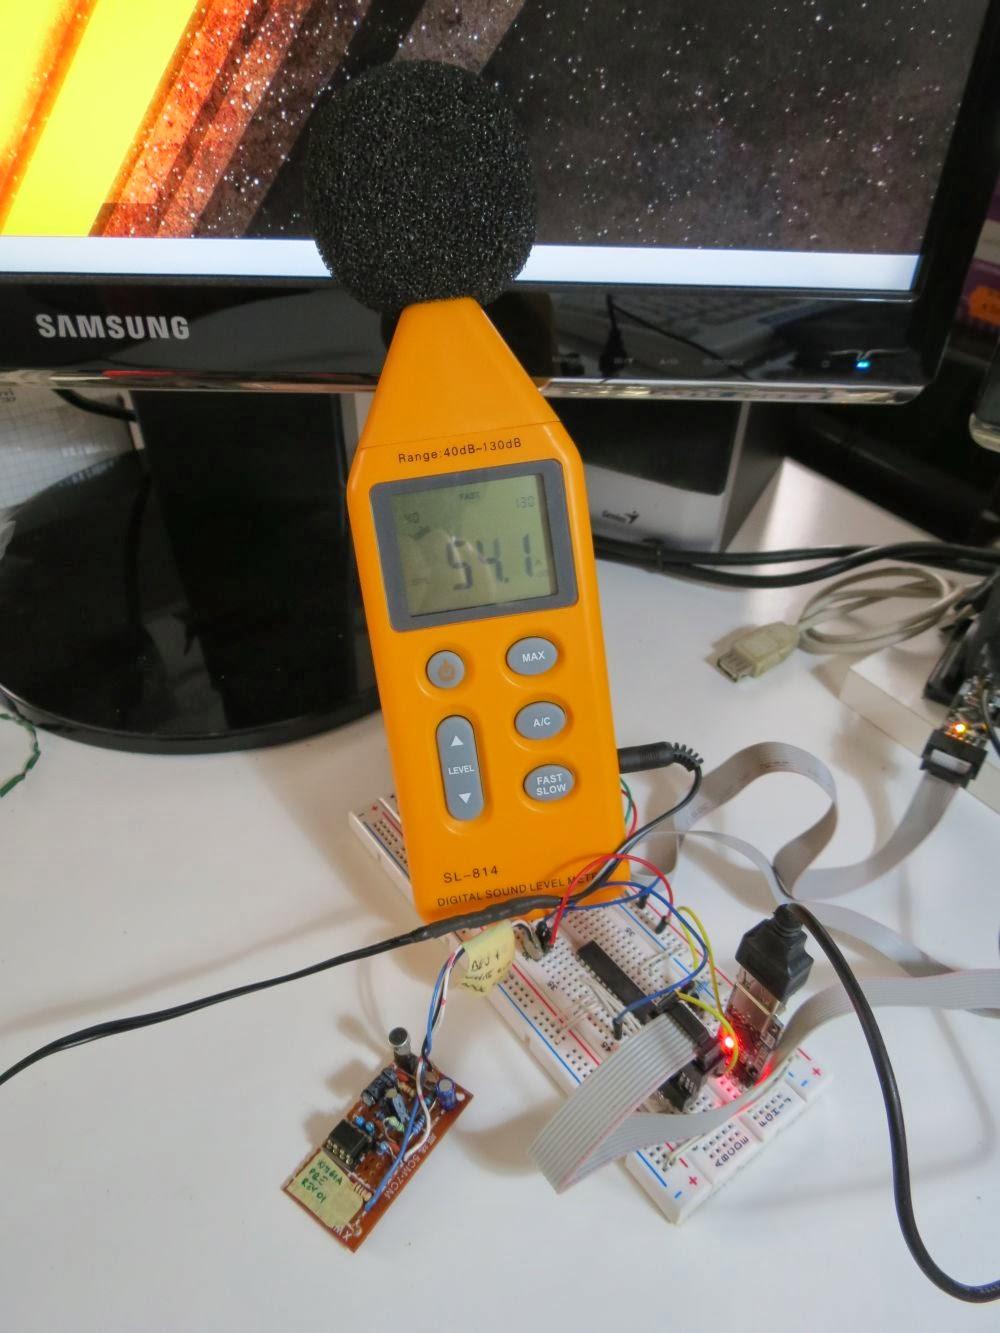 davide gironi a simple sound pressure level meter (spl) db audio